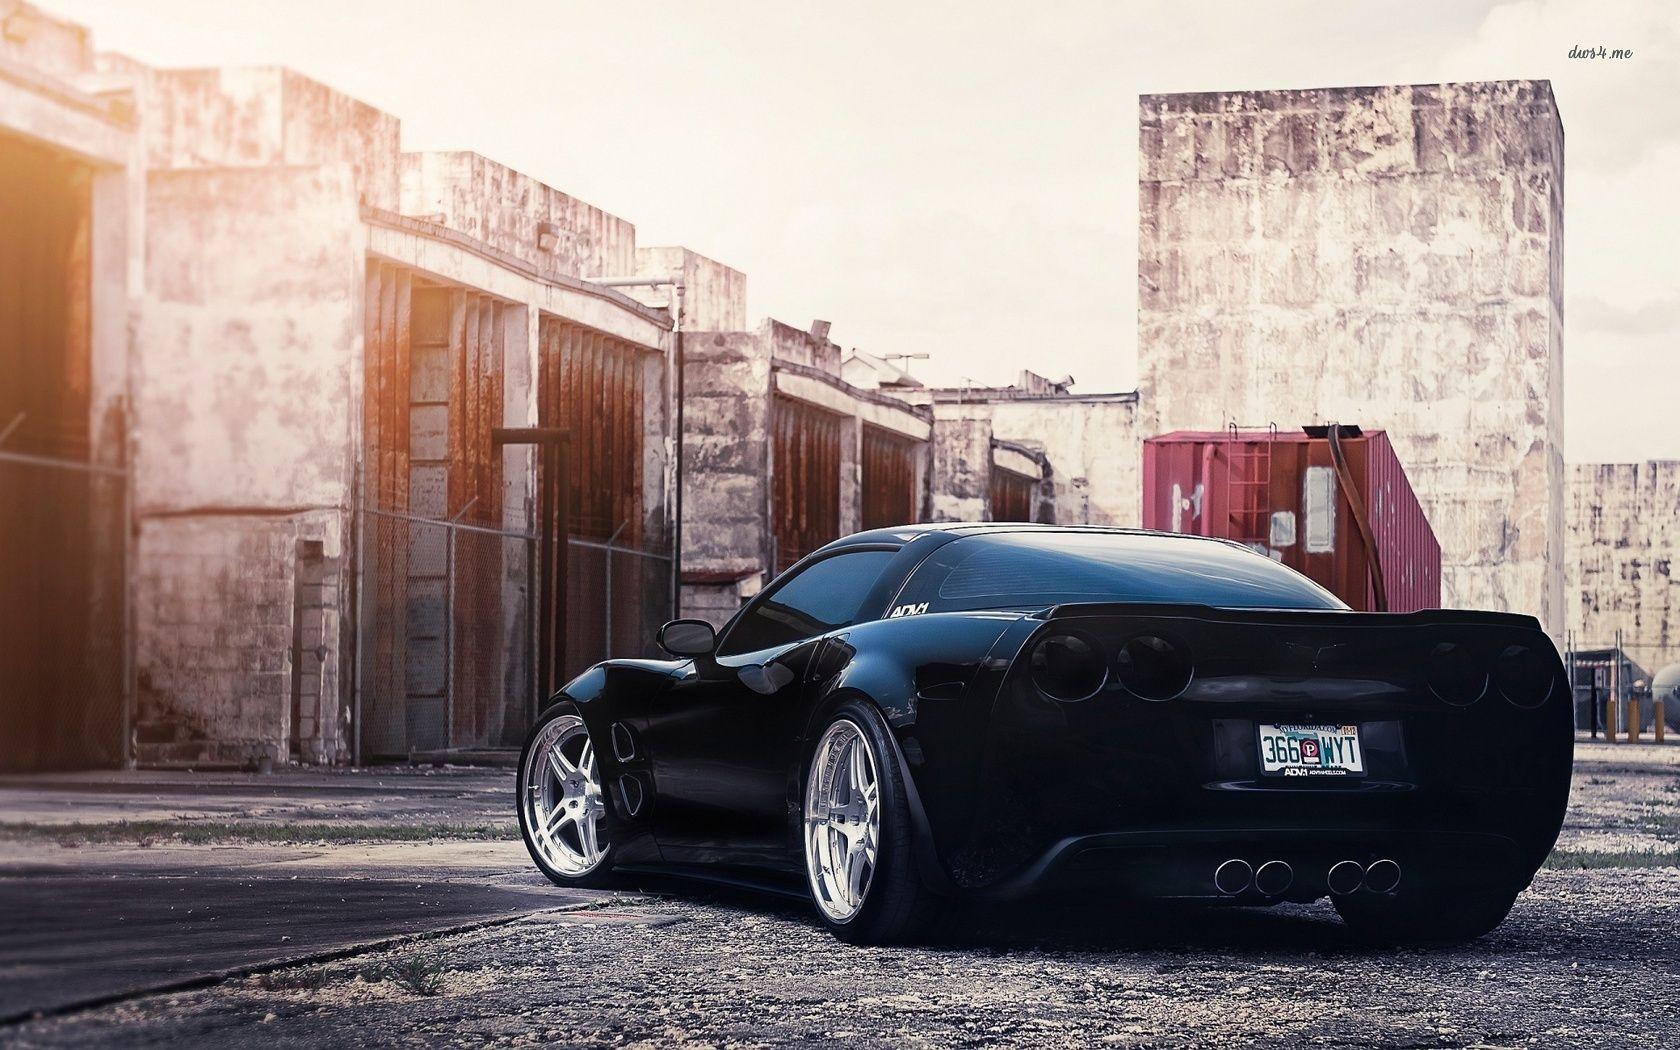 Fondos De Pantalla De Autos Netbook: Chevrolet Corvette ZR1 Wallpaper